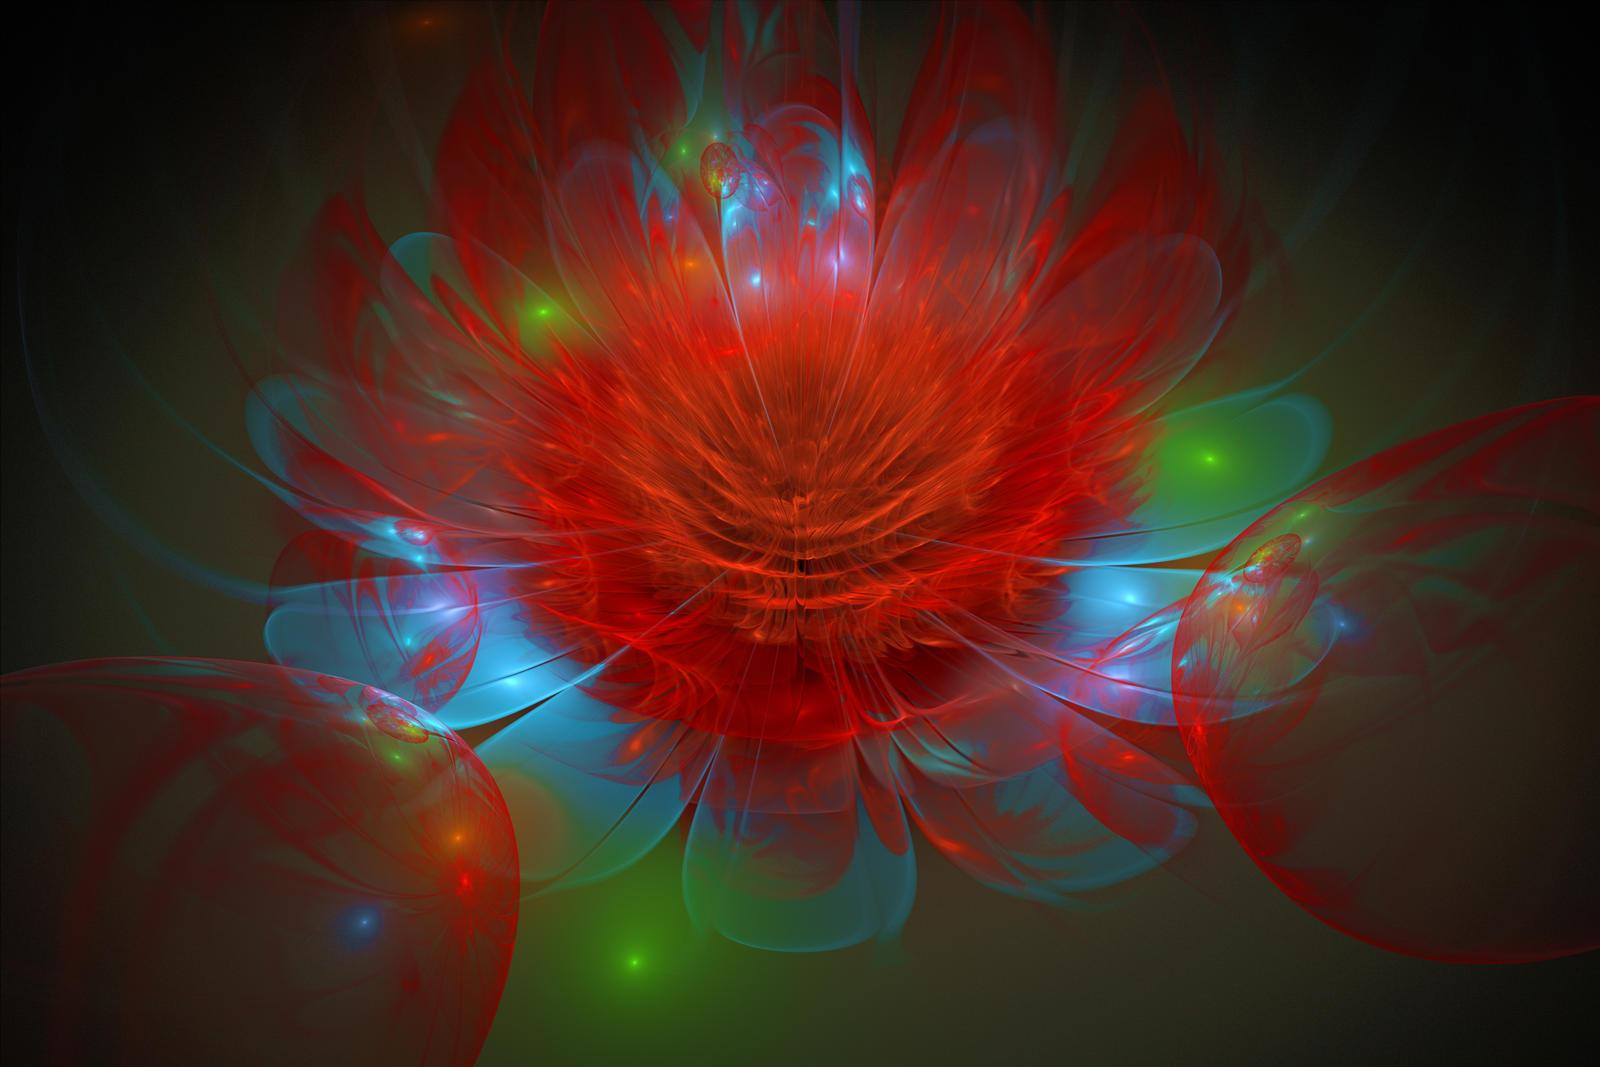 Red Rose for Yoko by Encoder6